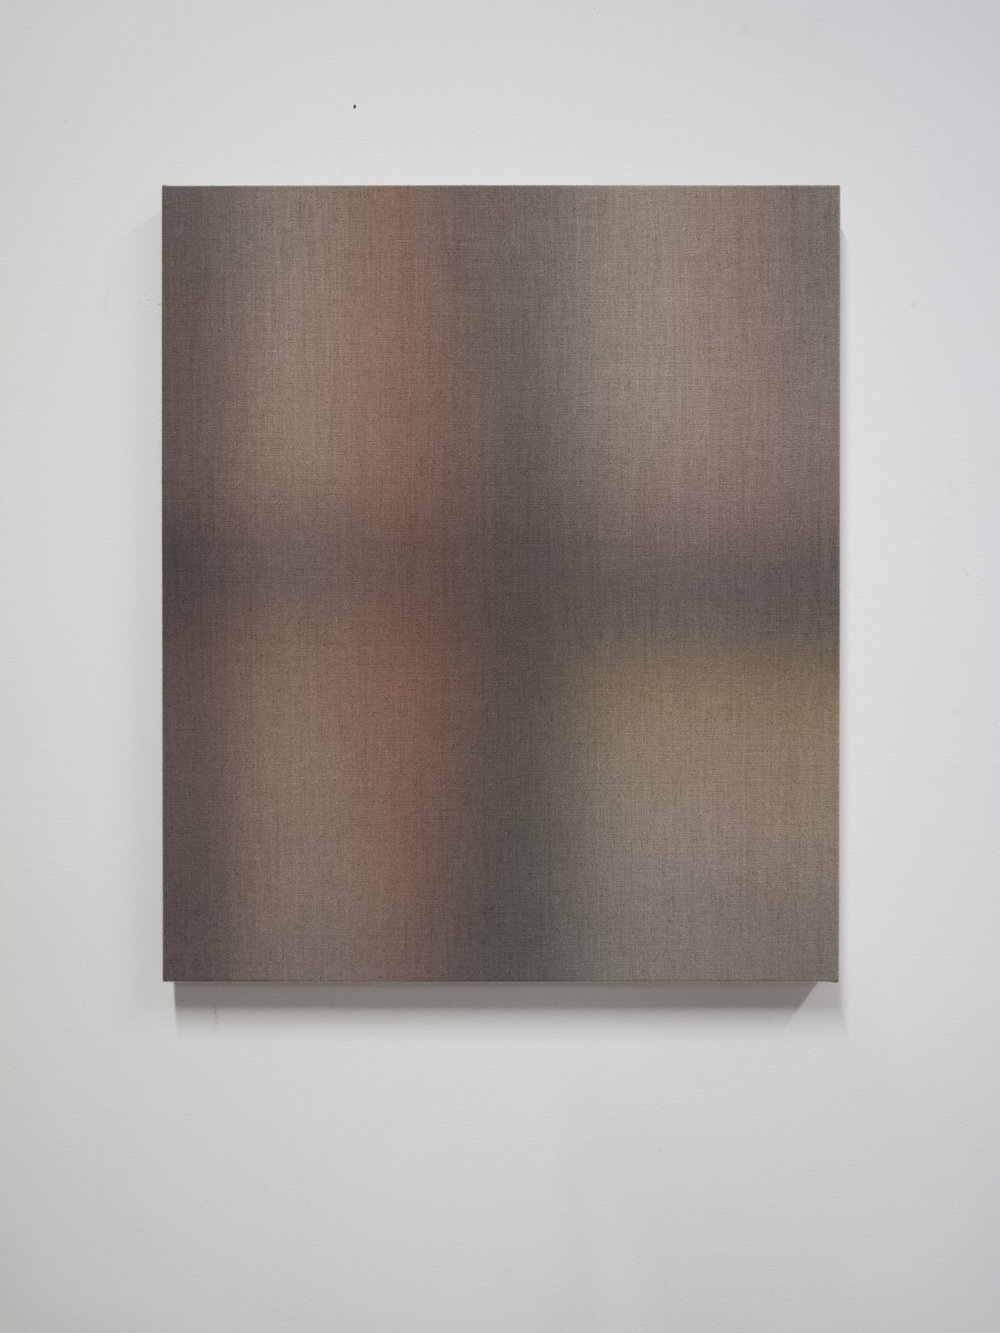 Erlend Grytbakk Wold,  'First Light I',  2018 Watercolor on unprimed linen, 70 x 60 cm